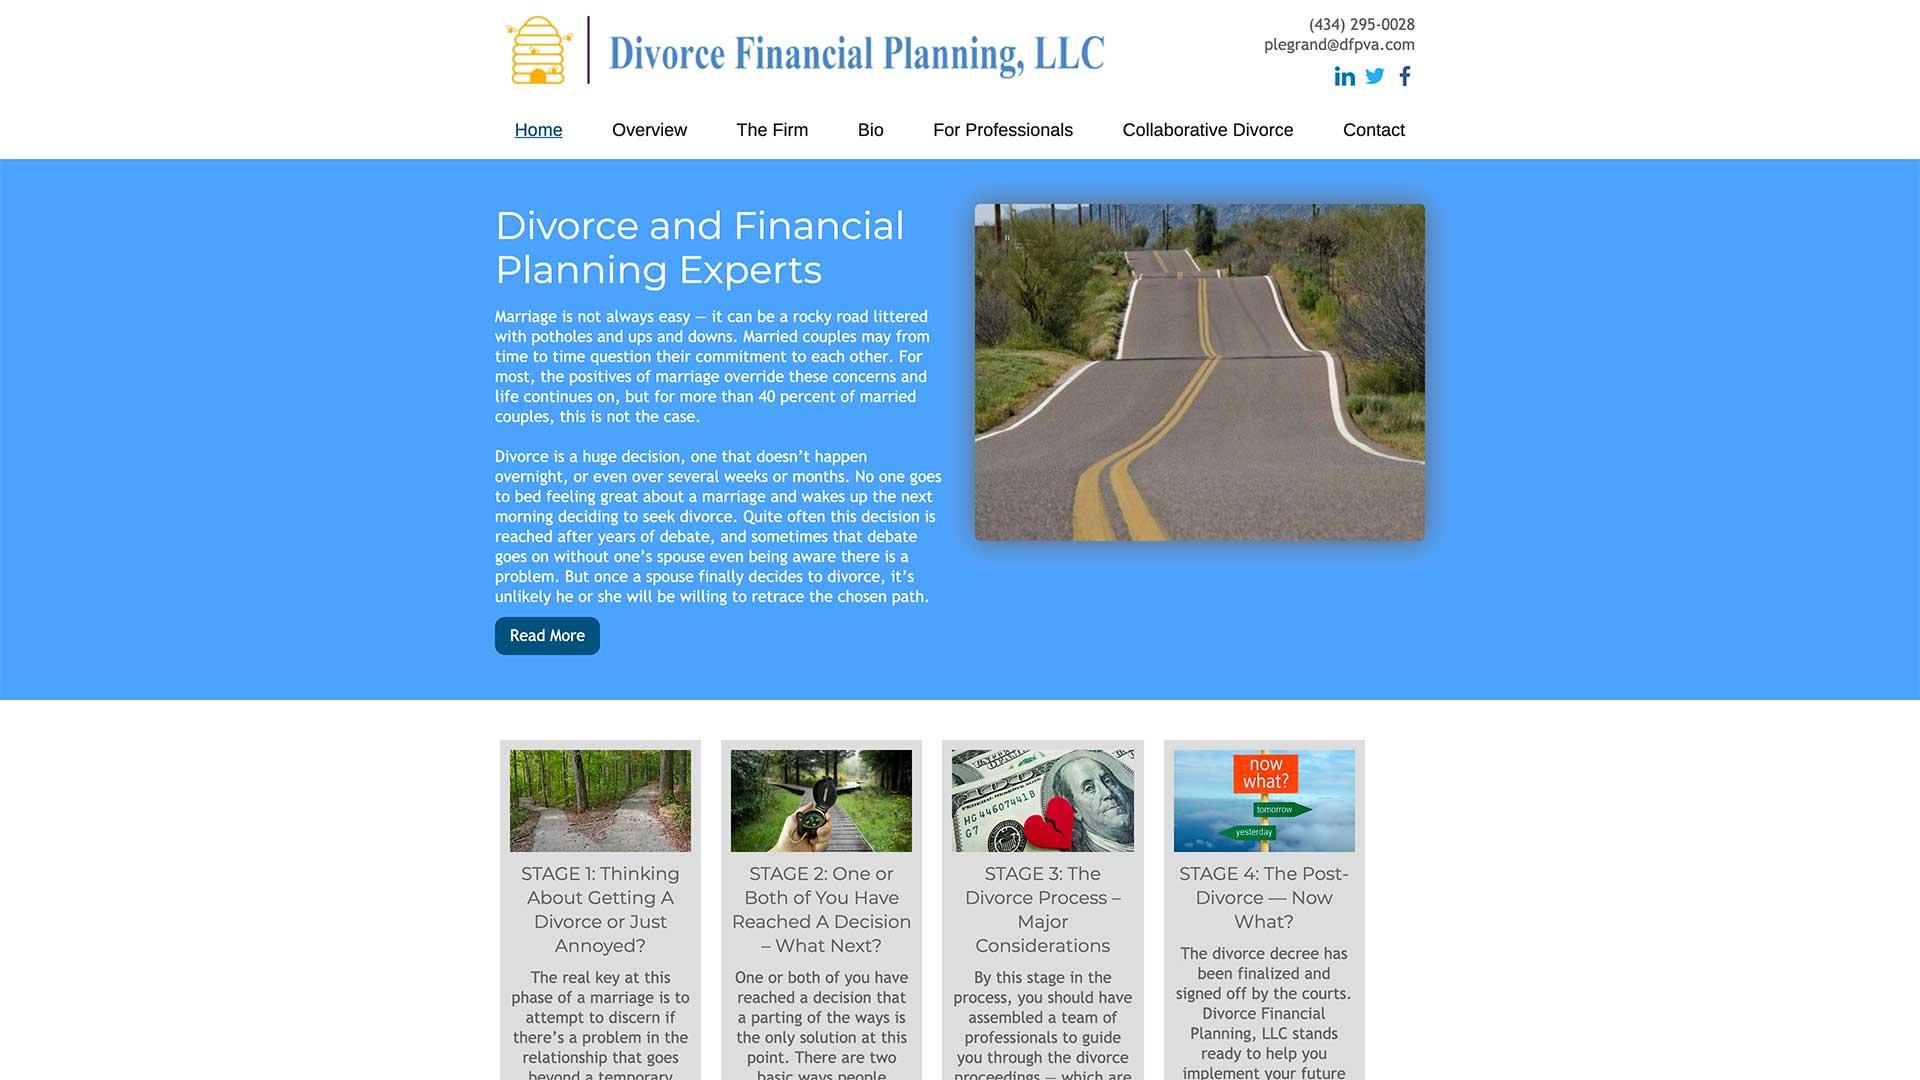 Divorce Financial Planning, LLC